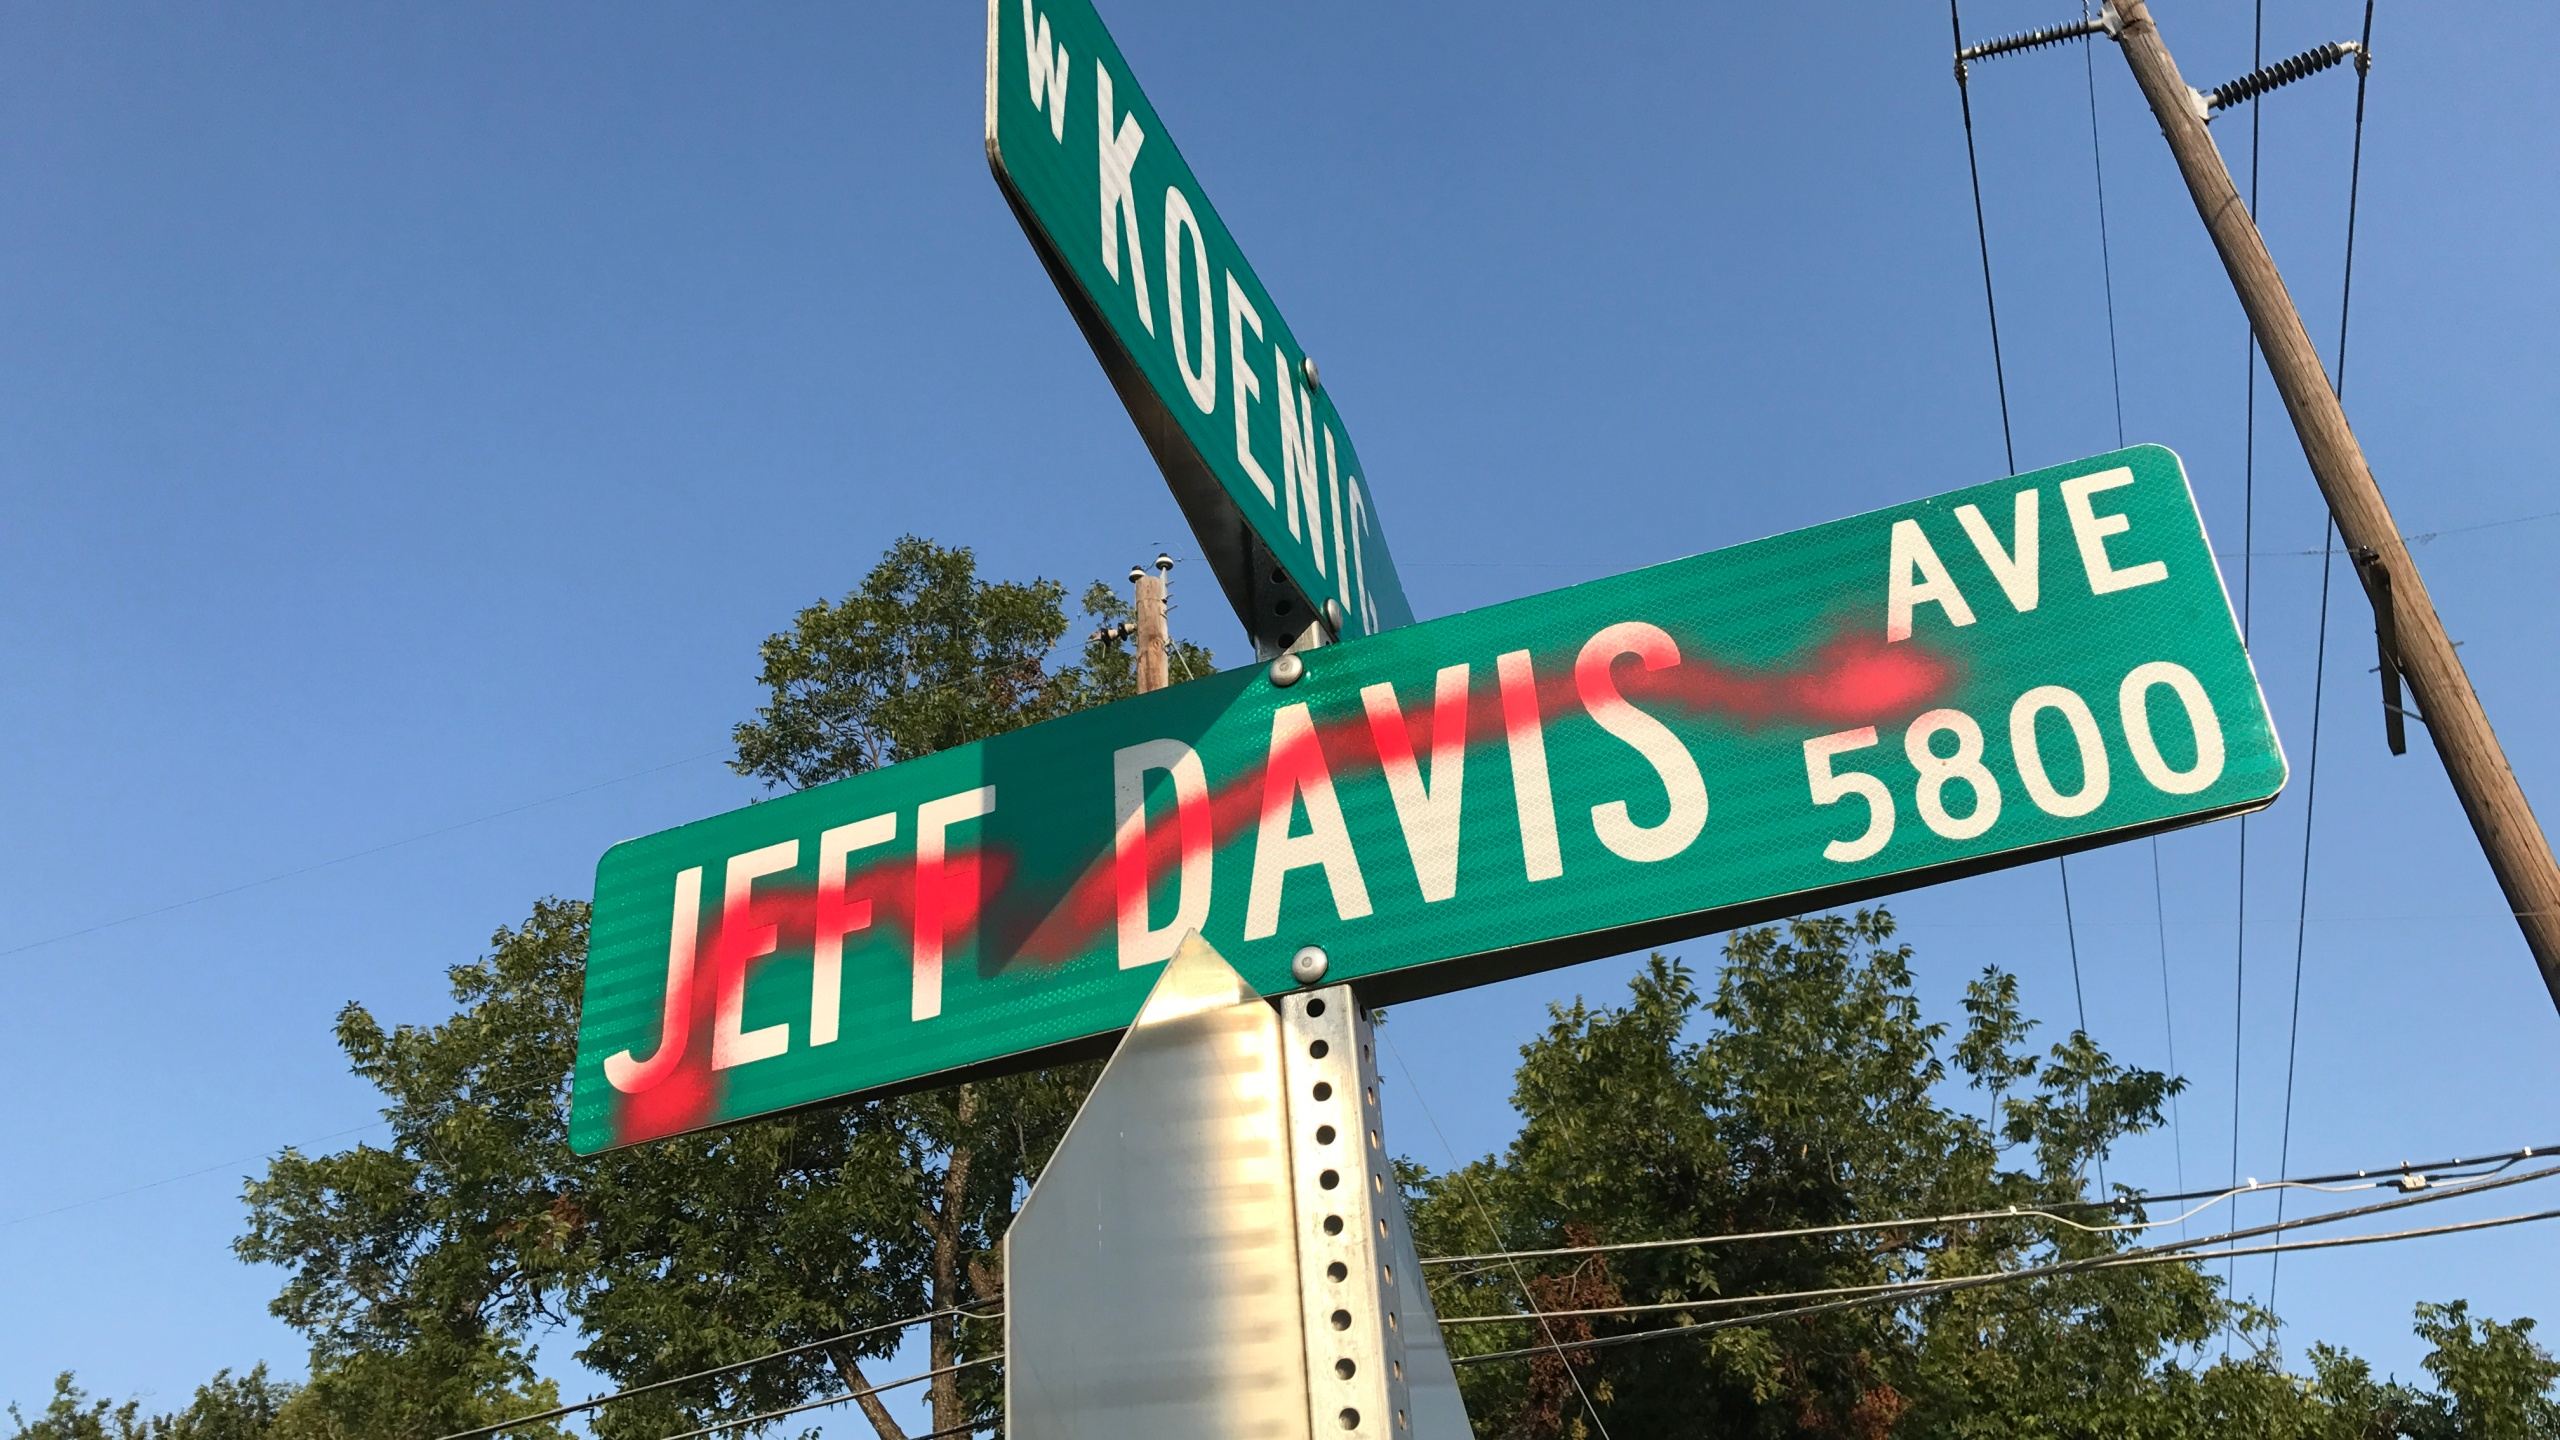 jeff davis sign vandalized_536229